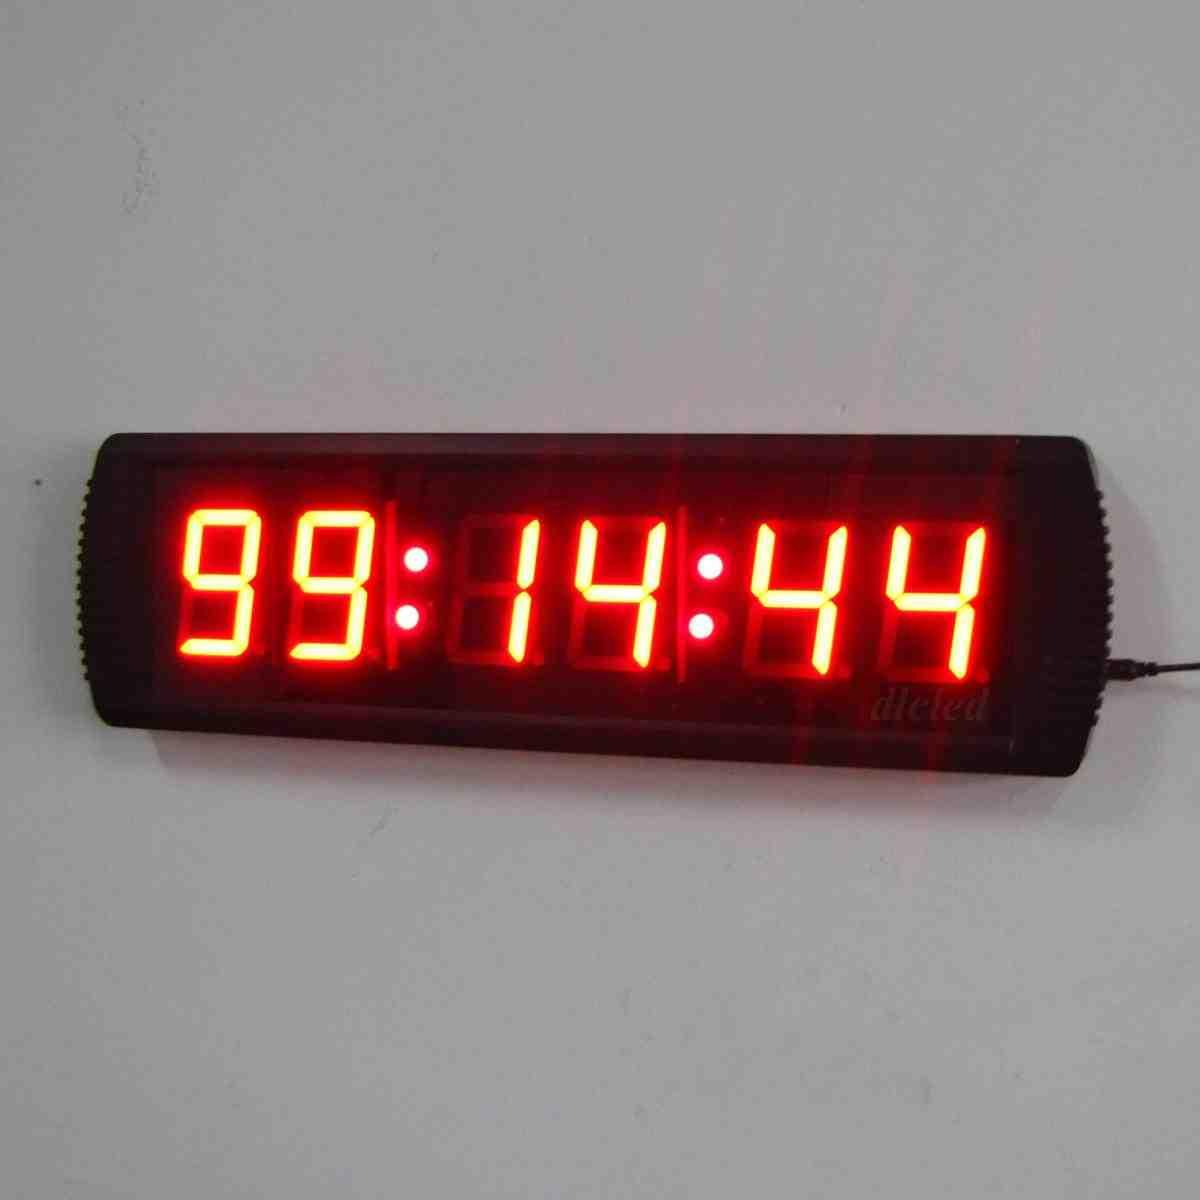 Large Digital Wall Clock With Seconds Decor Ideasdecor Ideas